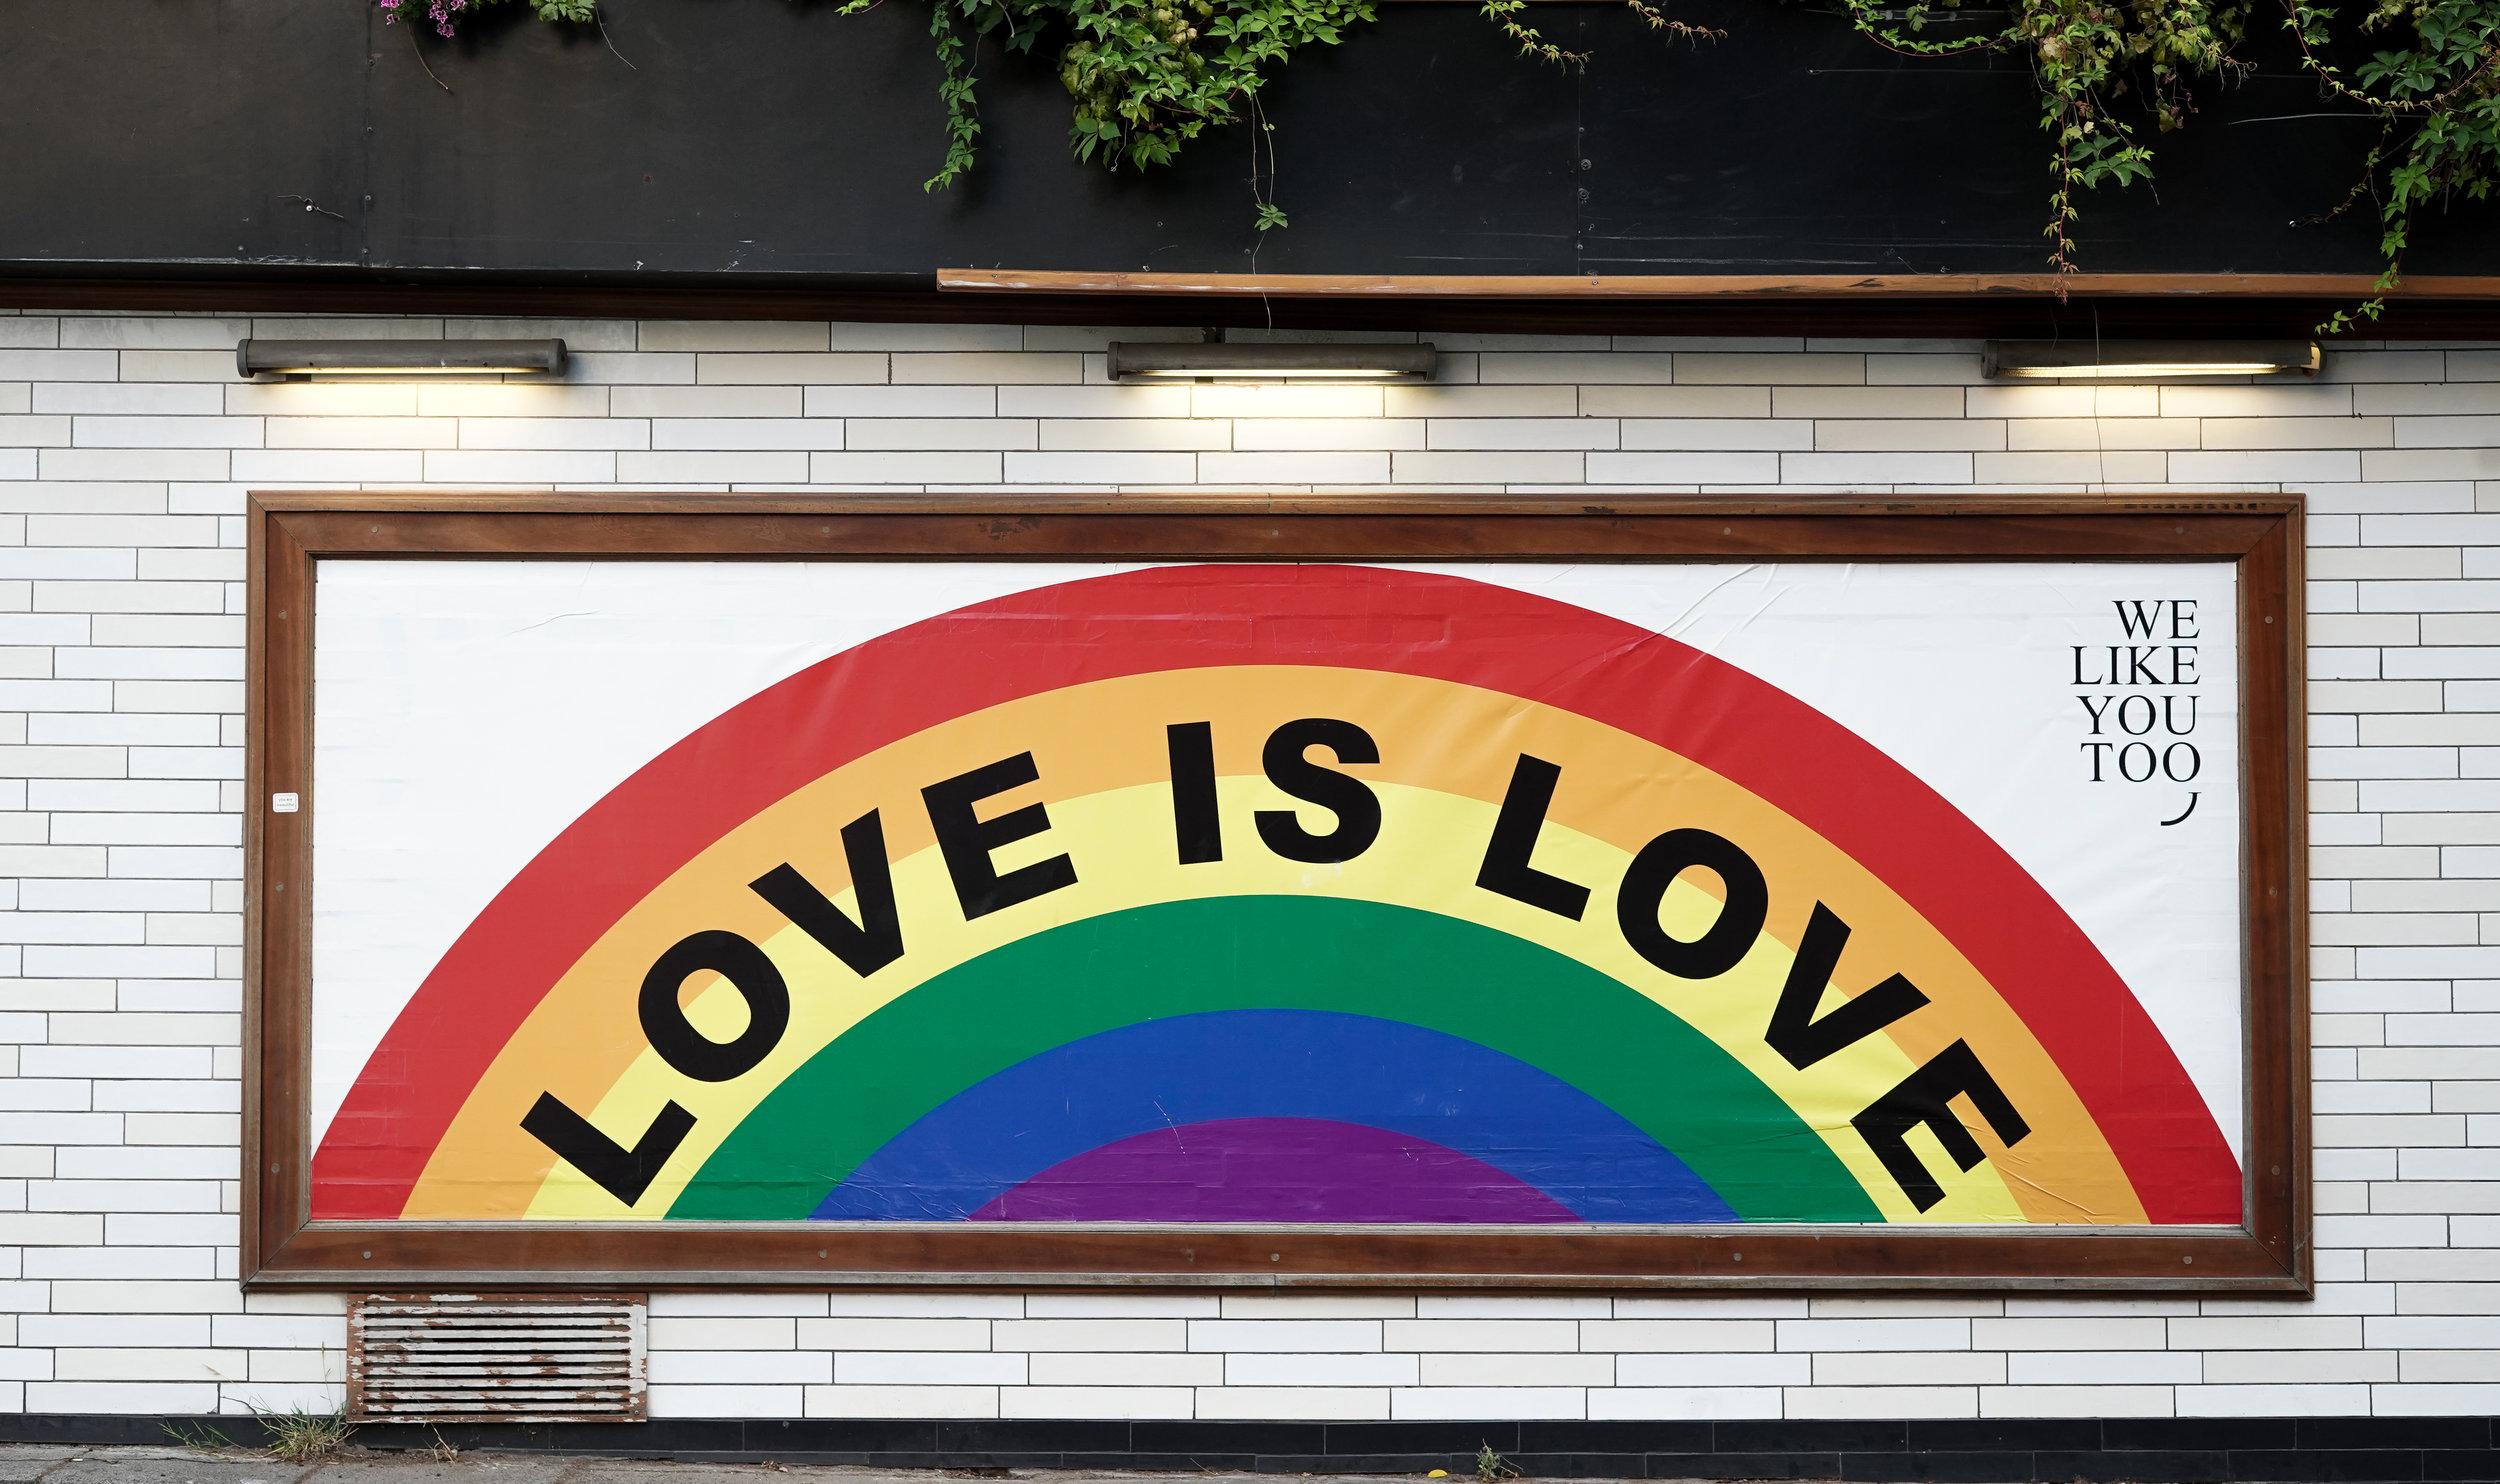 Pride isn't parades, it's community